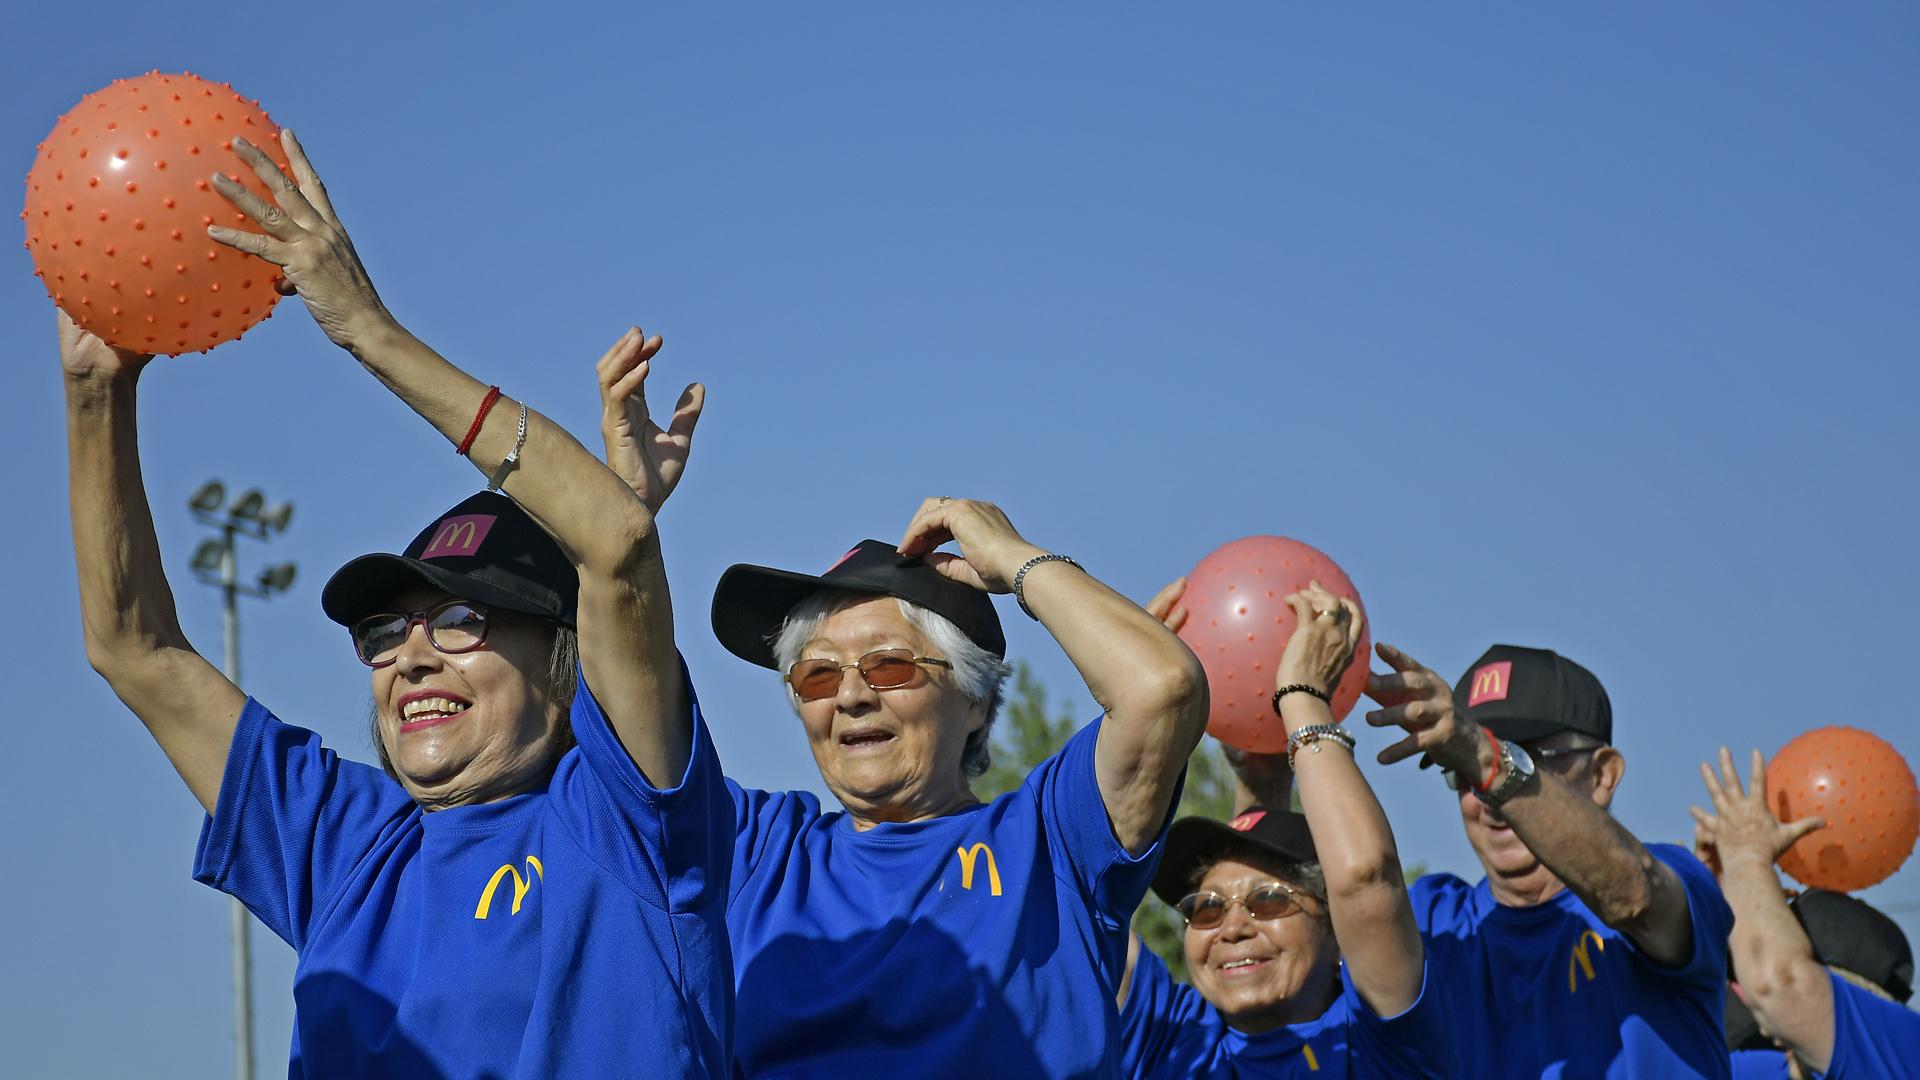 [Chile] Adultos Mayores se mantienen activos gracias a talleres deportivos a distancia